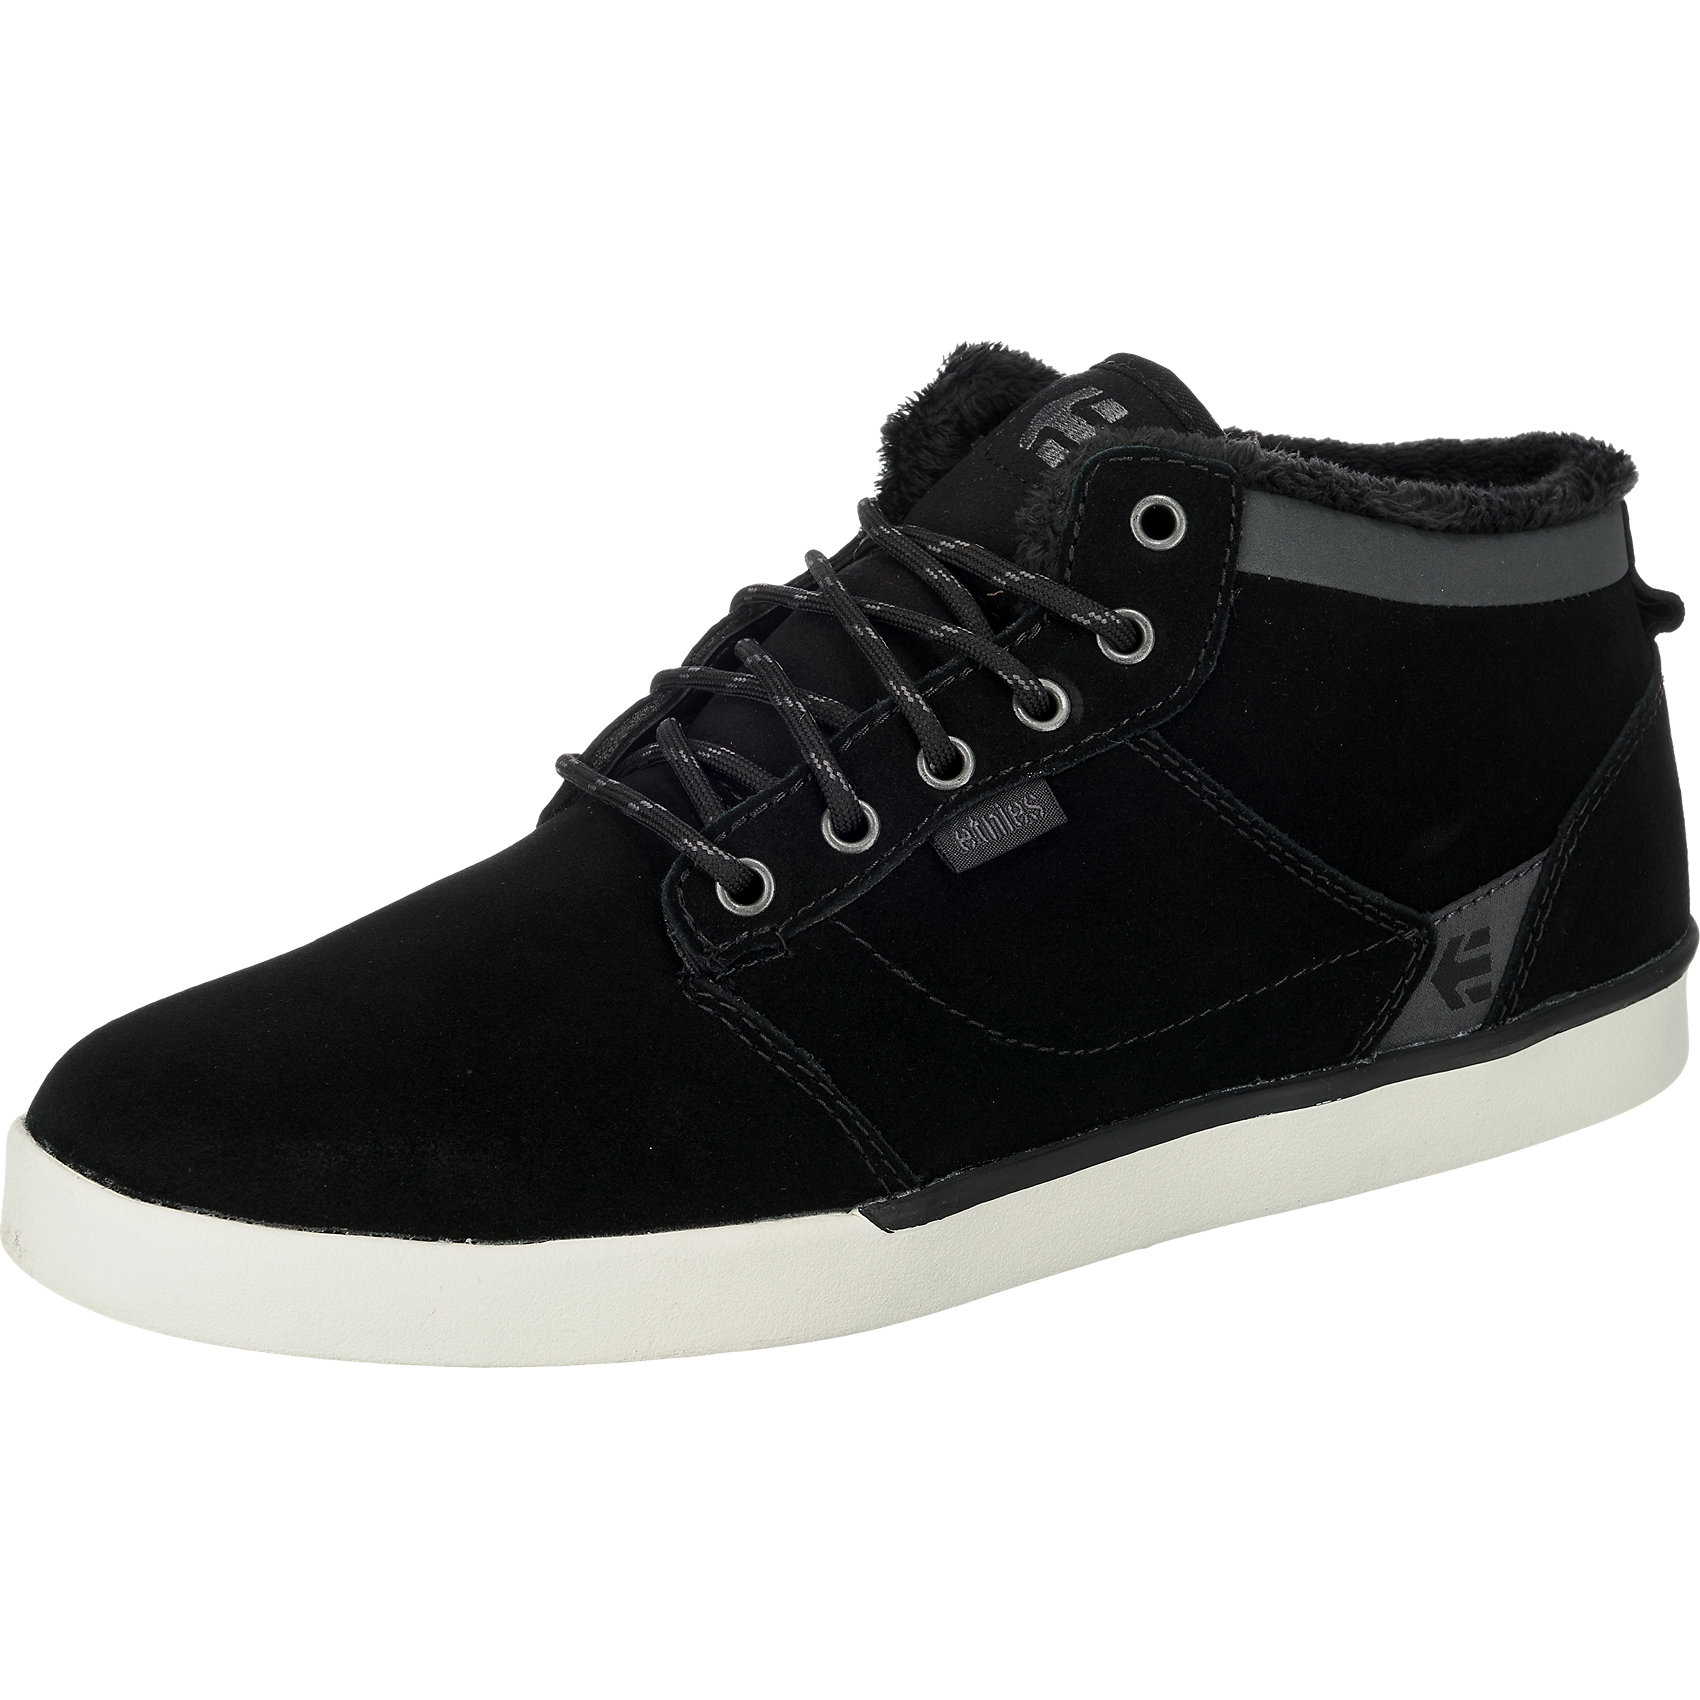 Neu etnies Jefferson Sneakers navy schwarz 5761095